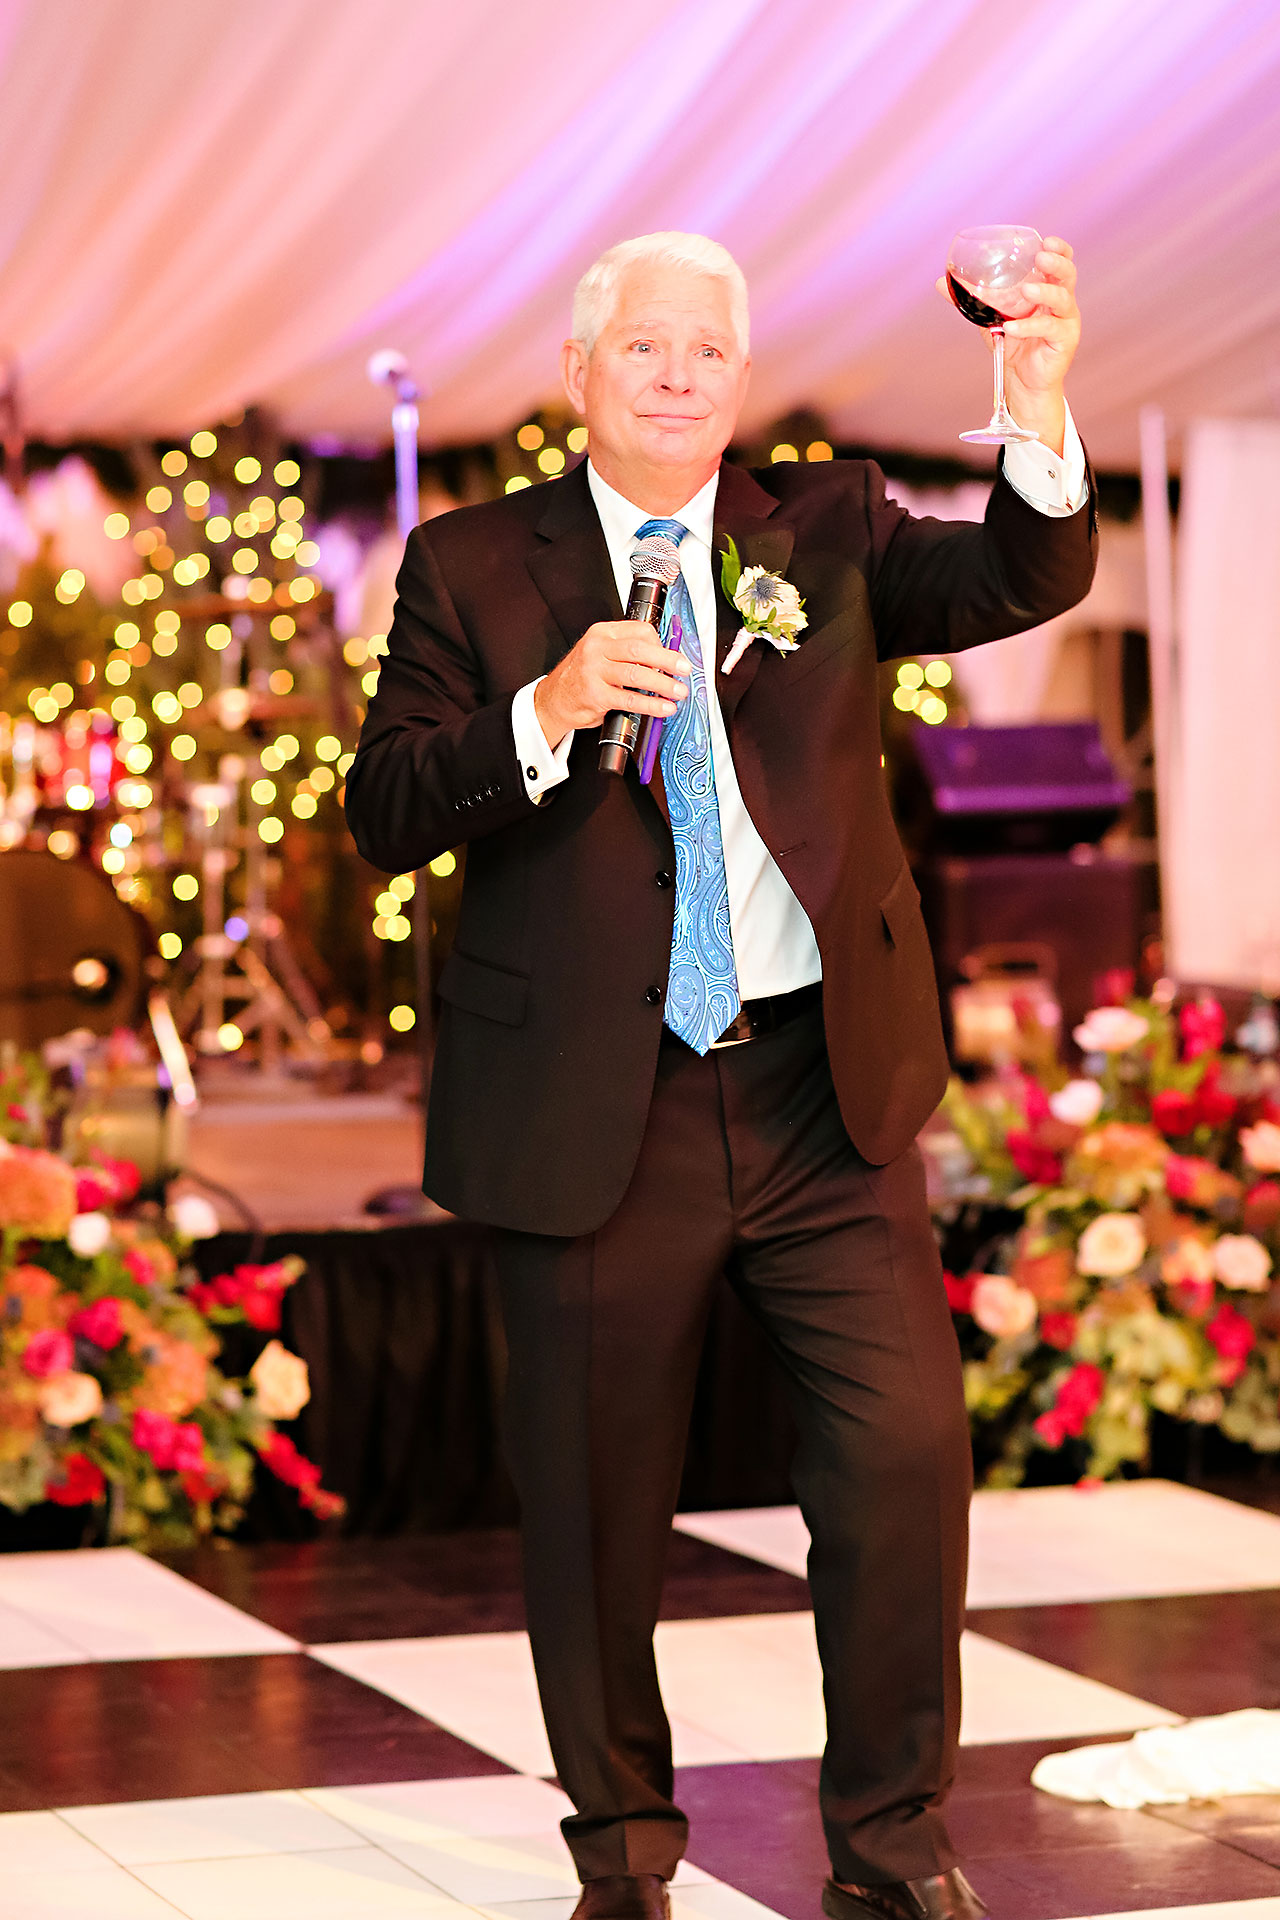 Ashley Steve Bloomington Indiana Wedding 315